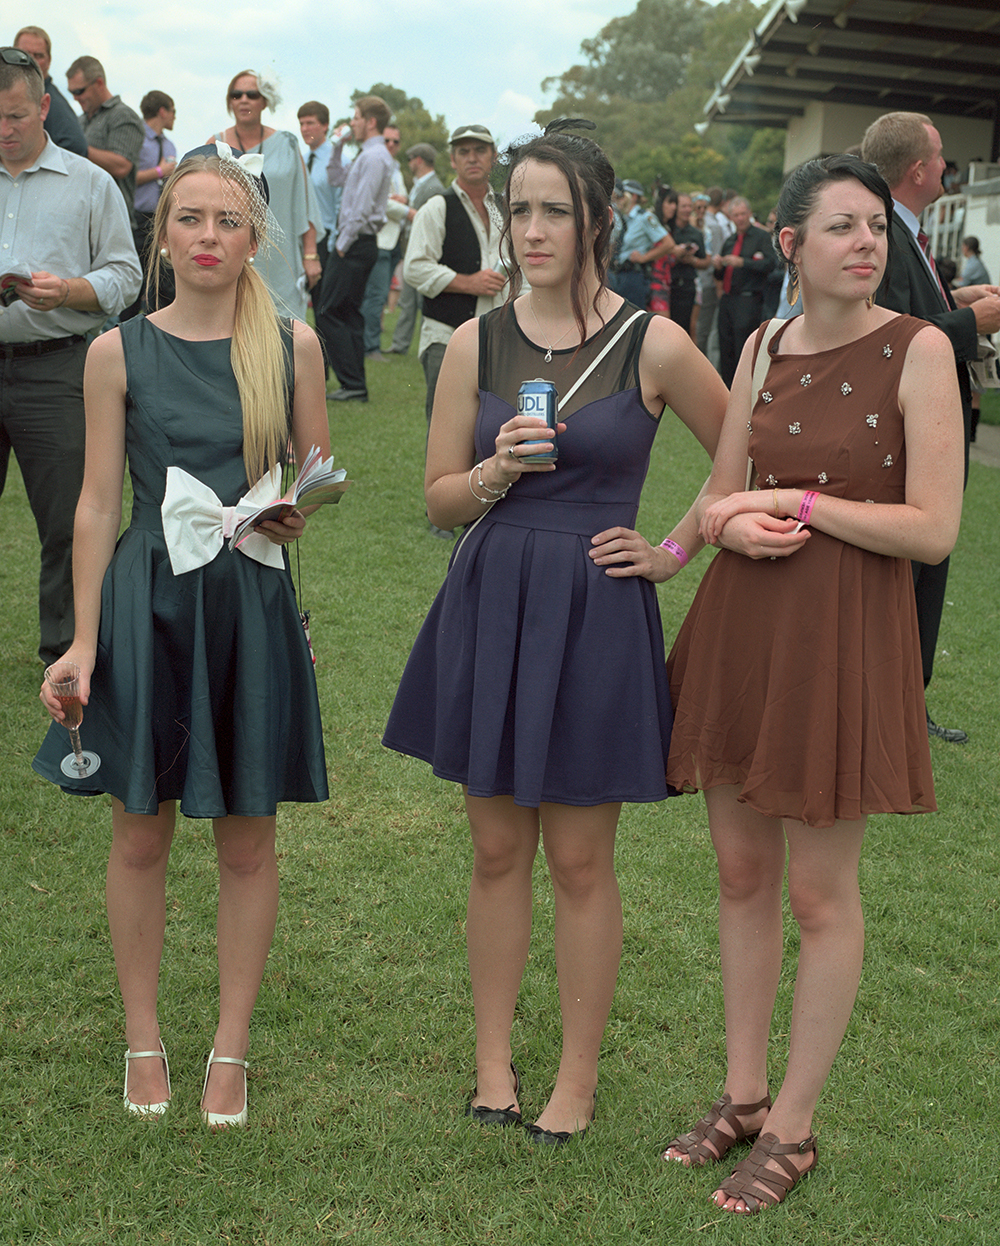 UDL; Albury Cup, Albury, NSW; 2014